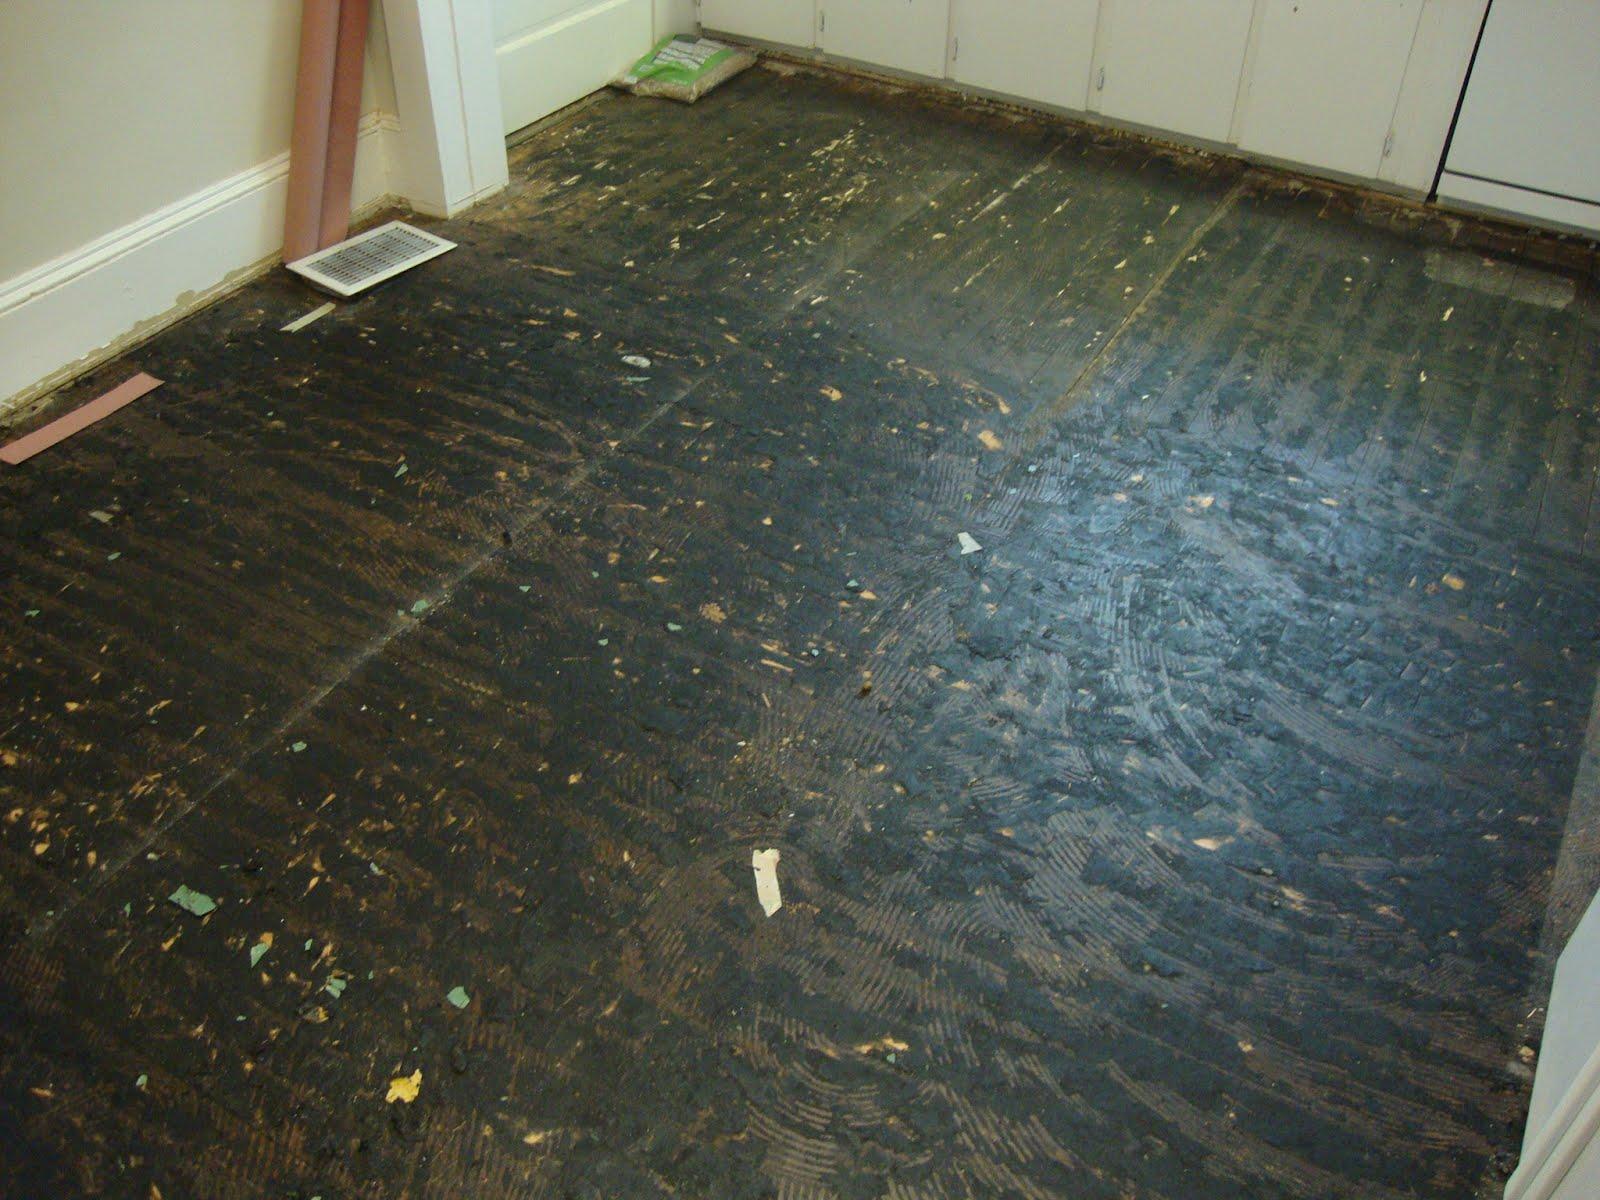 Asbestos Asbestos In Linoleum - Is there asbestos in linoleum flooring